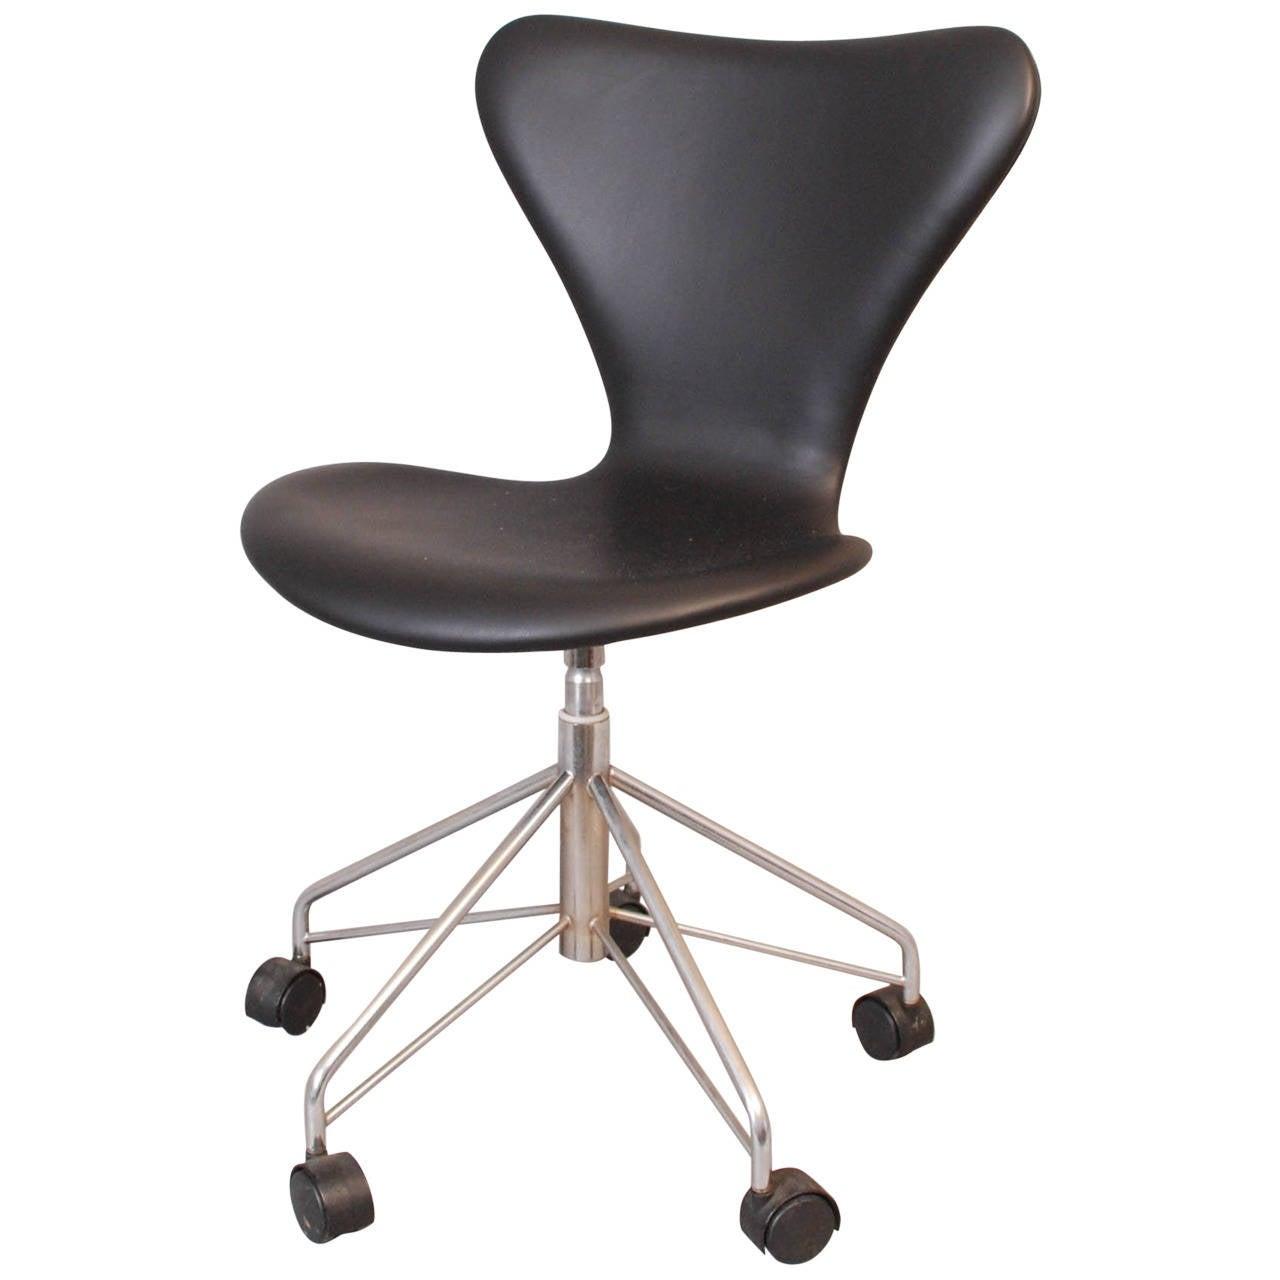 office swivel chair 3117 by arne jacobsen for fritz hansen. Black Bedroom Furniture Sets. Home Design Ideas